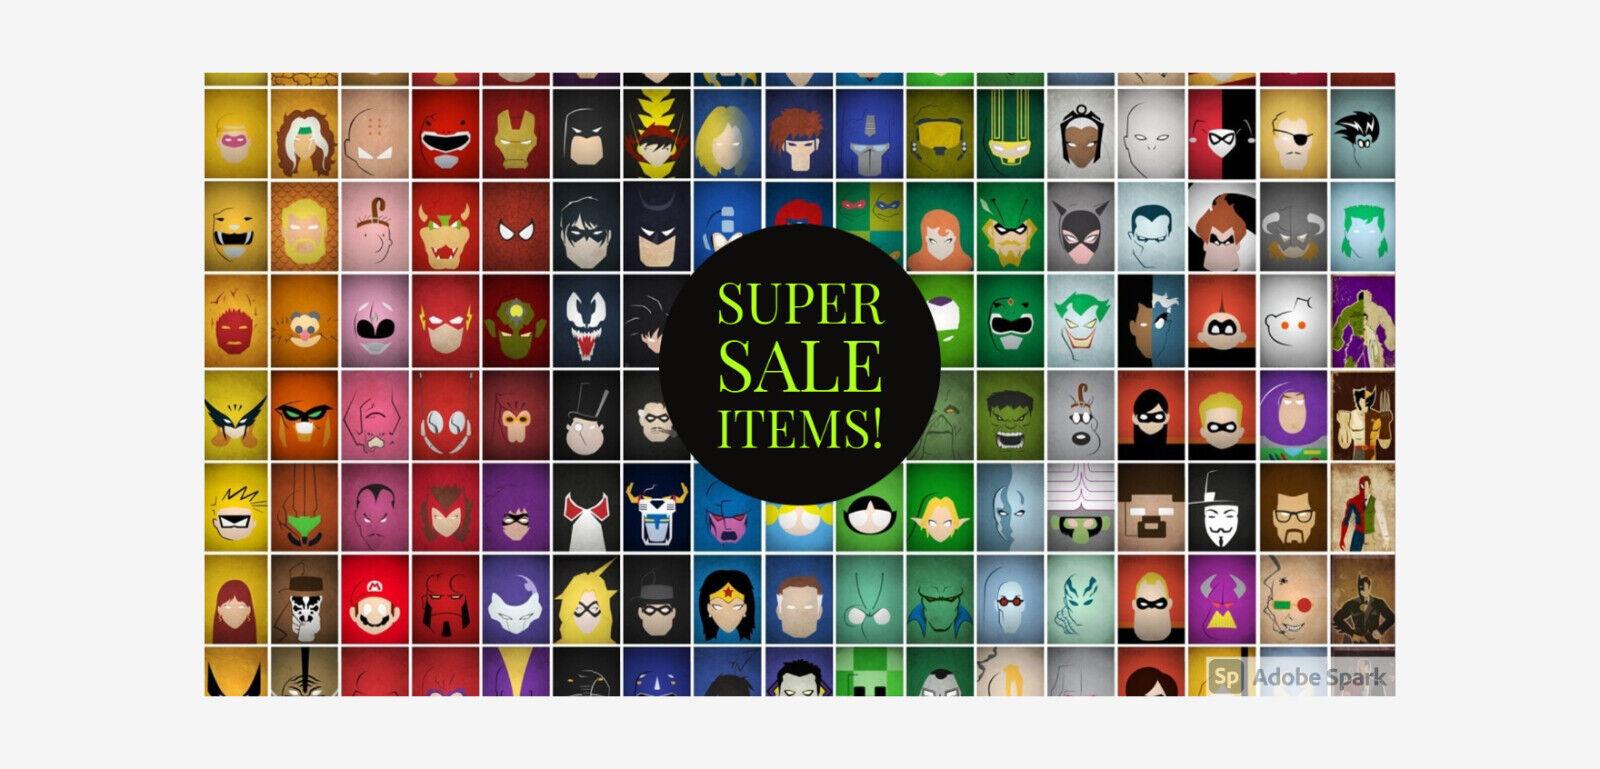 Super Sale items